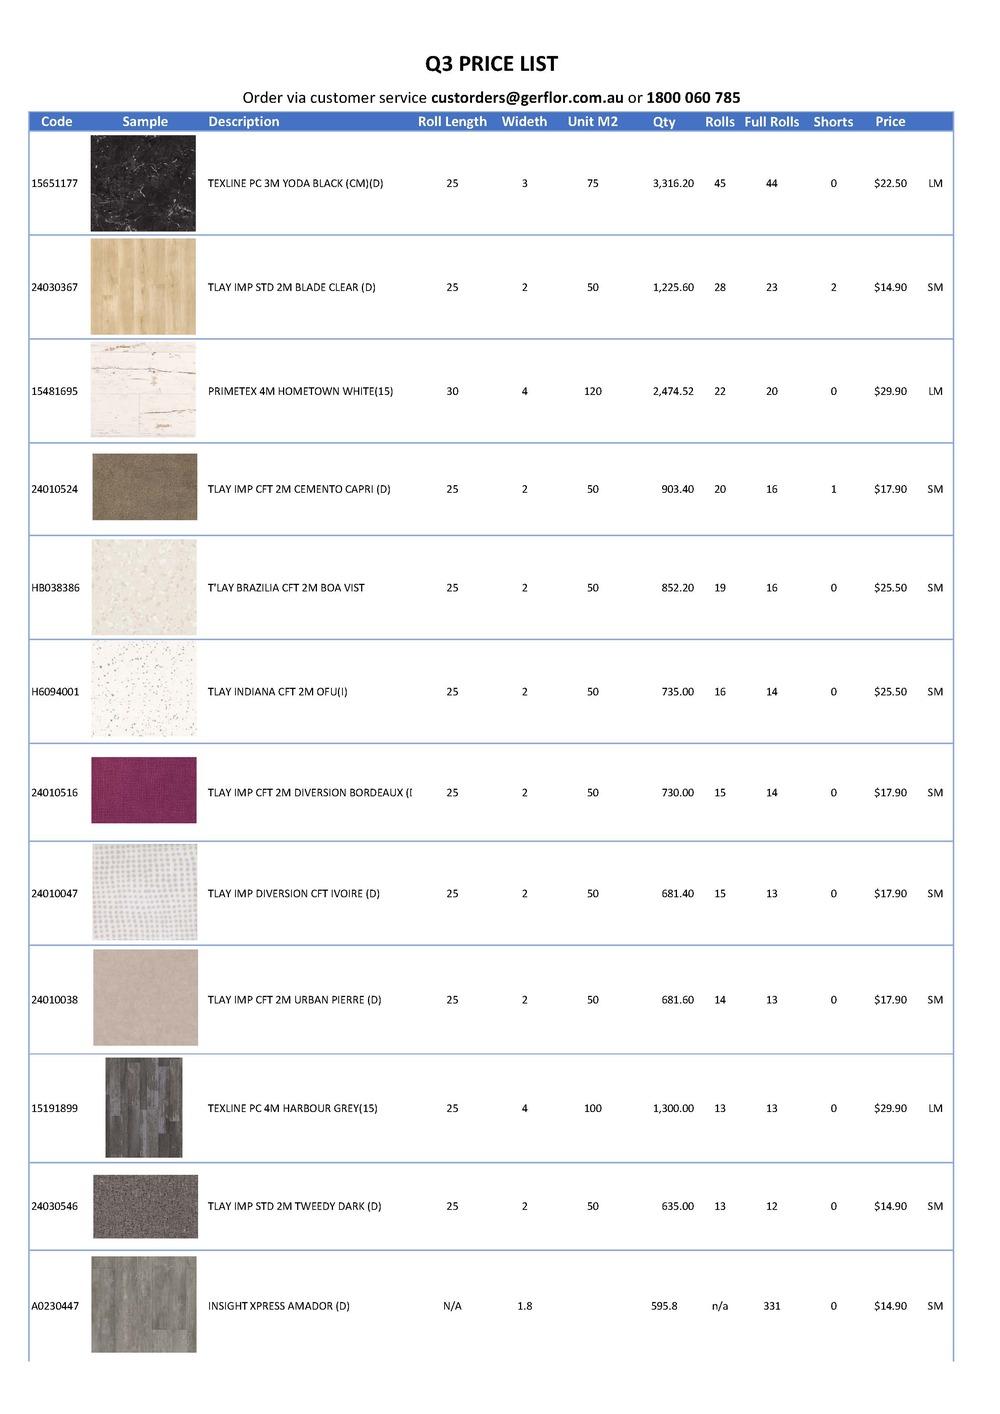 Q3 Price List Page 1